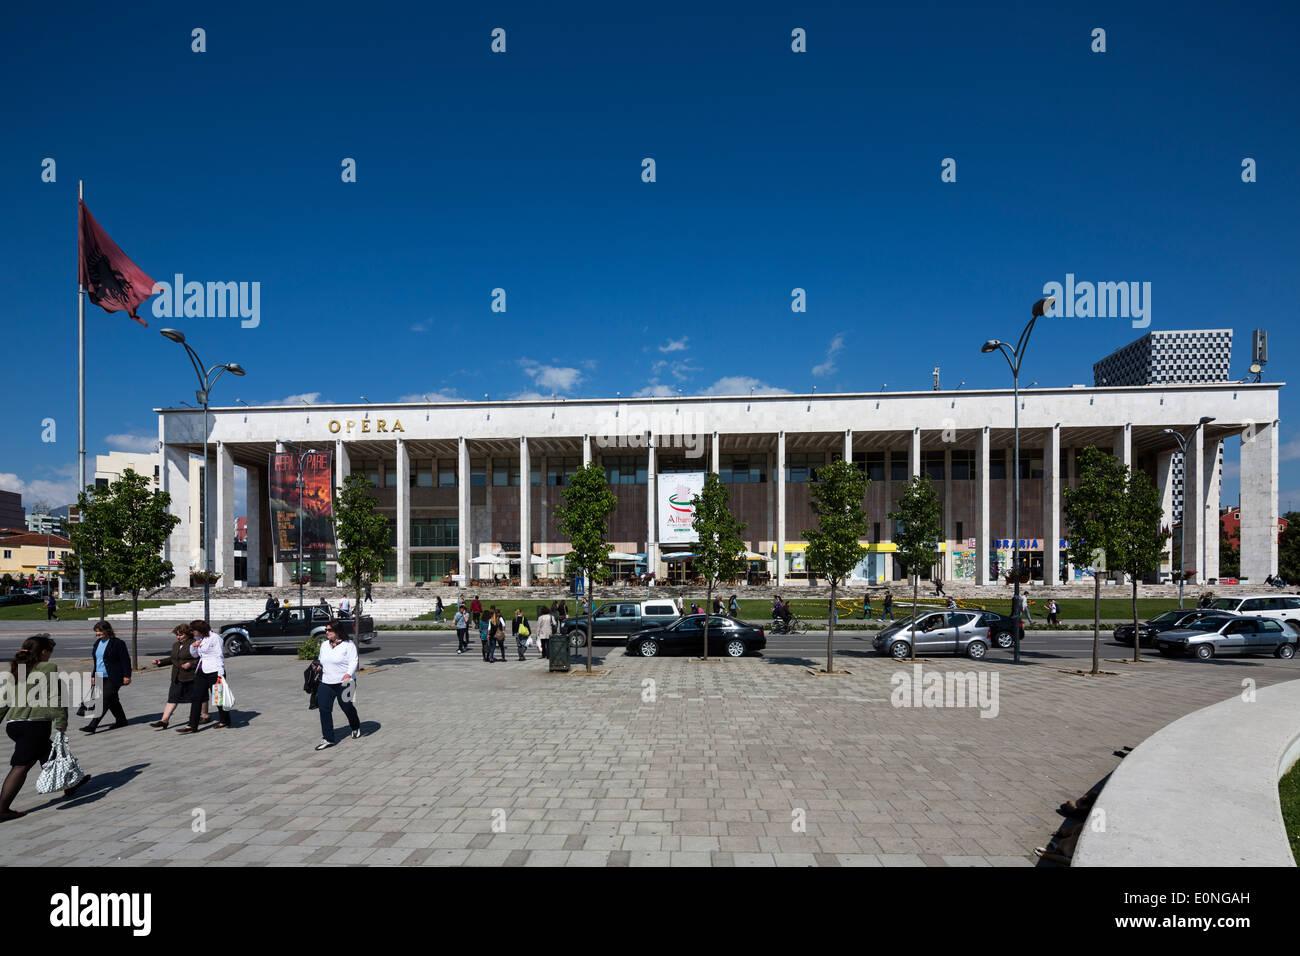 The Palace of Culture, Skanderbeg Square, Tirana, Albania - Stock Image